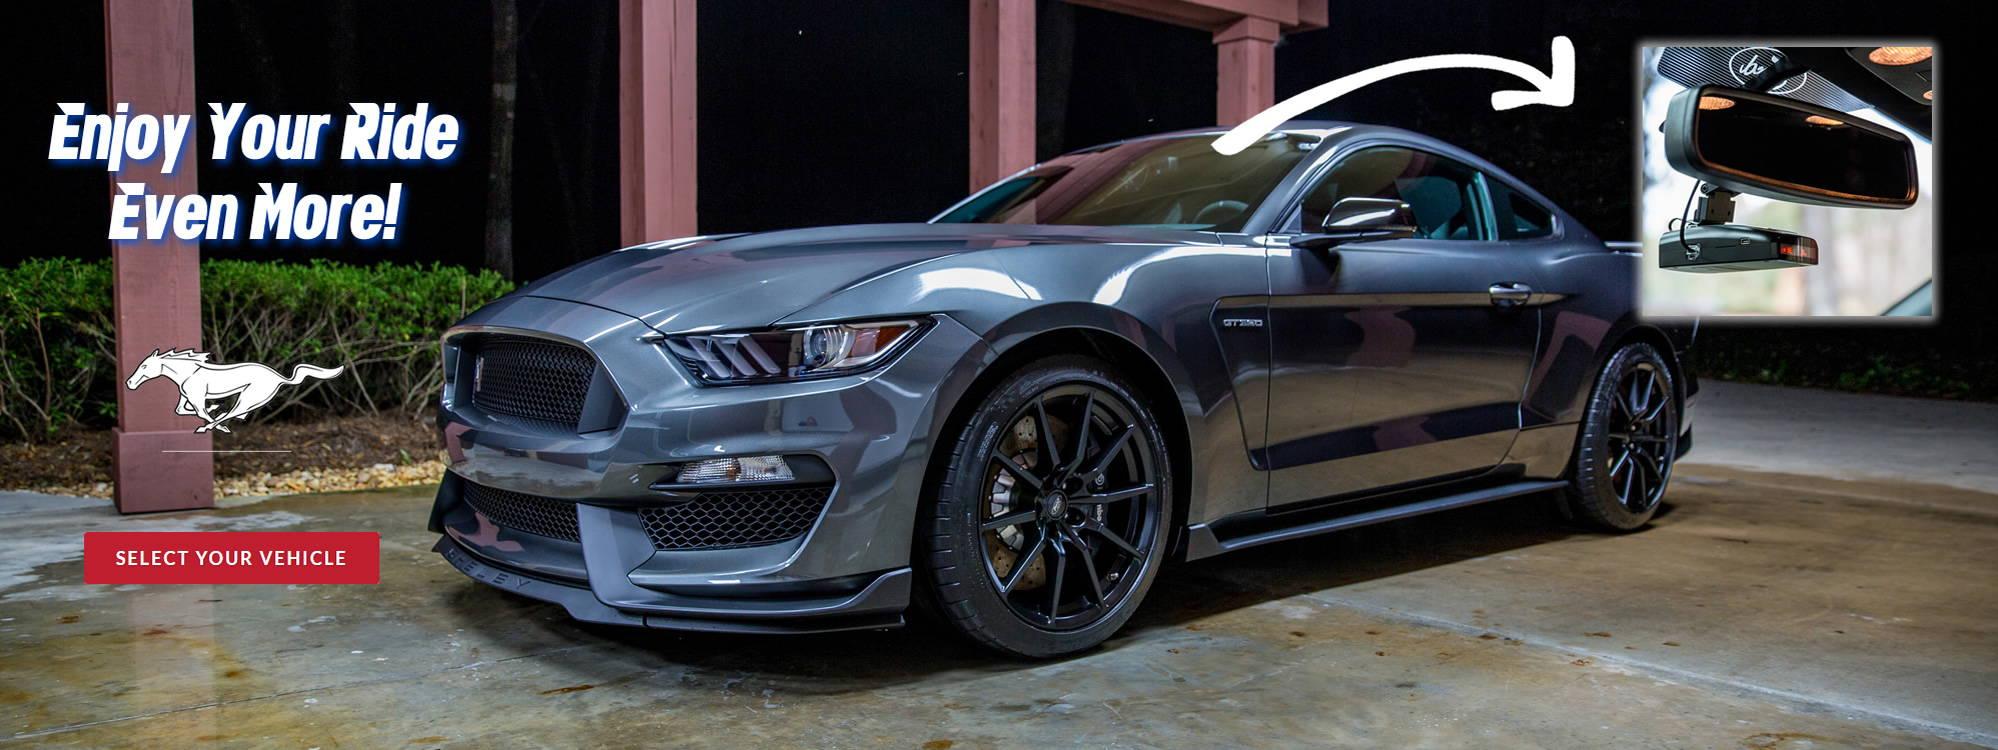 Mustang Radar detector mount